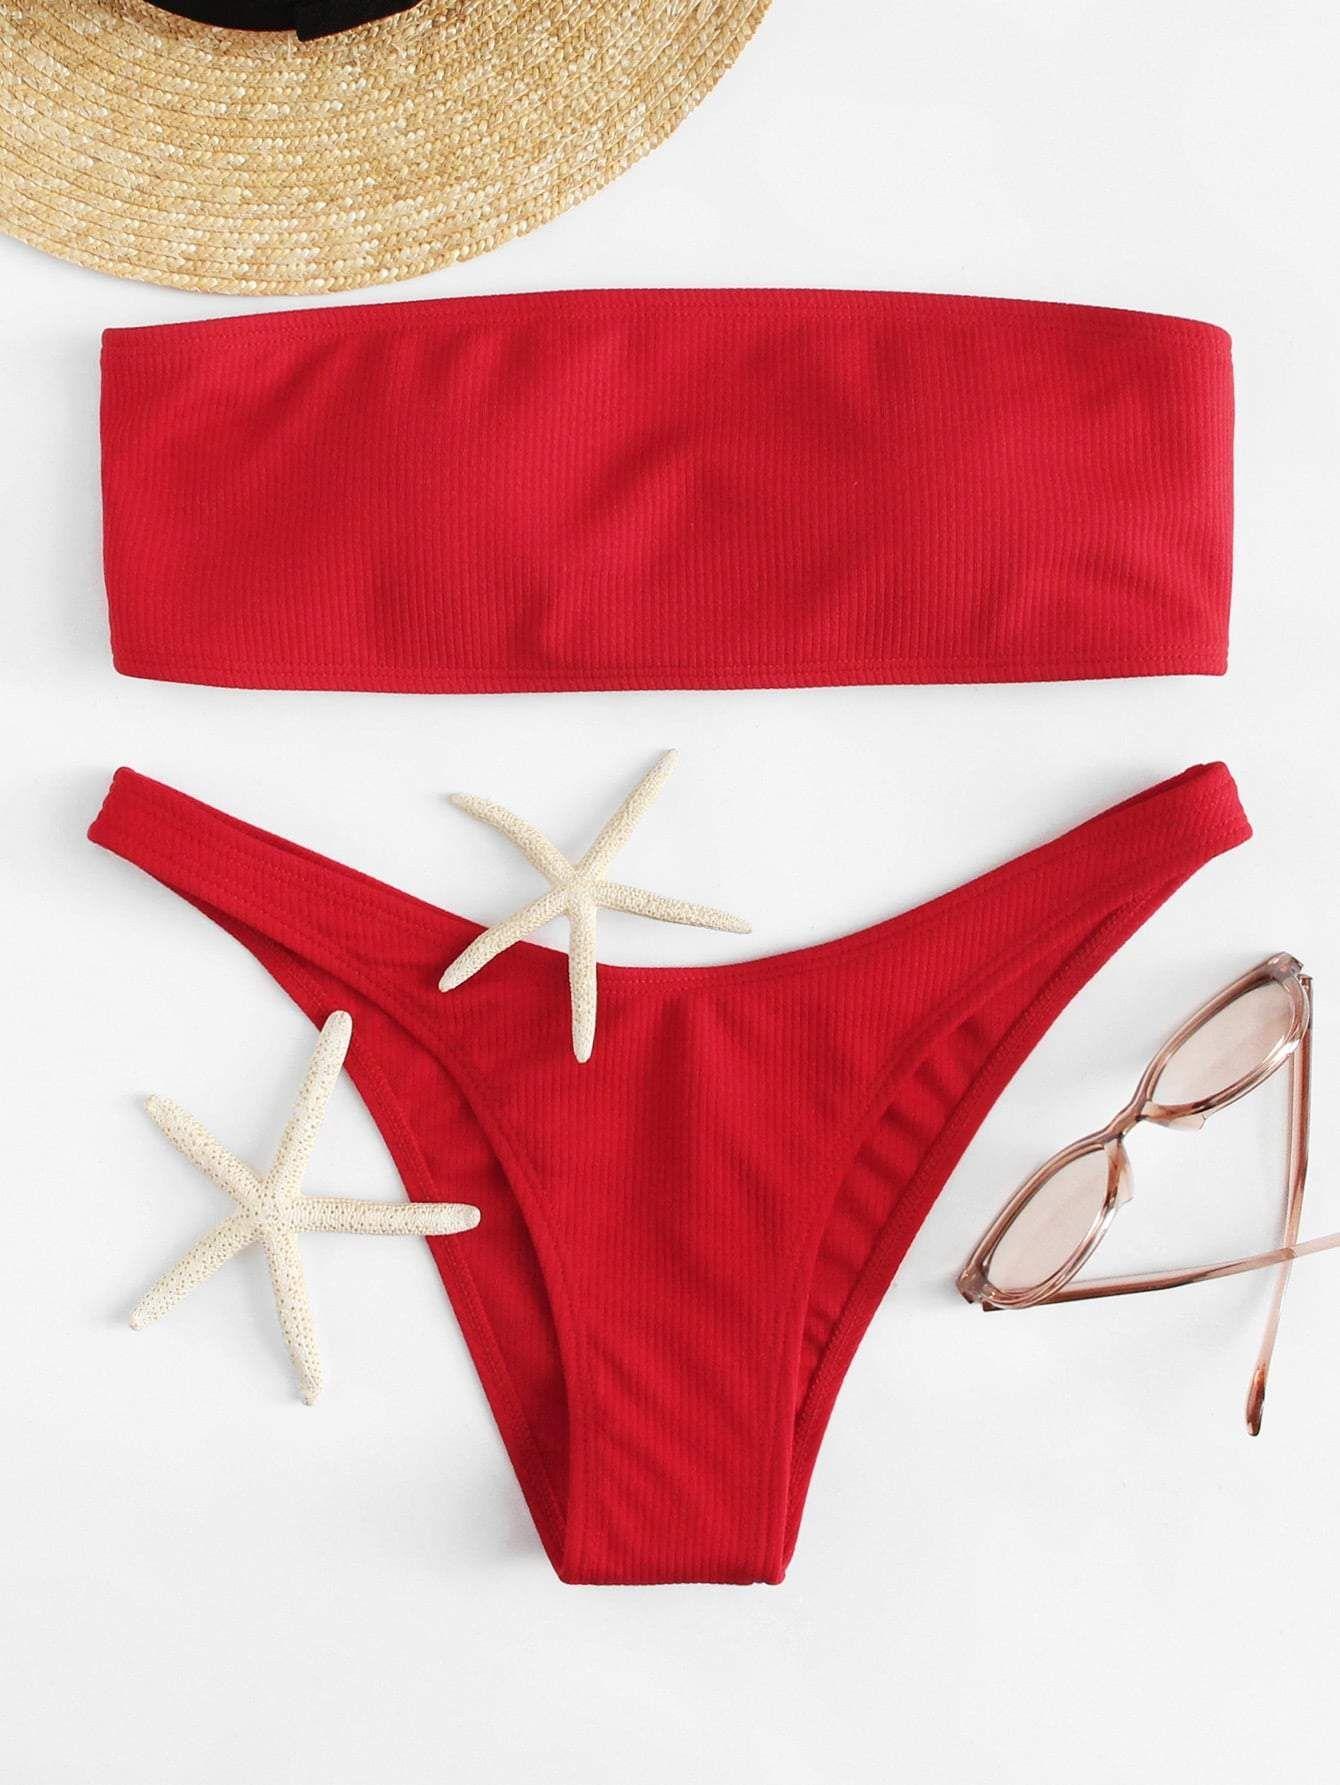 caa7c293ee lace up back bandeau with ribbed bikini set.  swimwear  beachwear  women   fashion